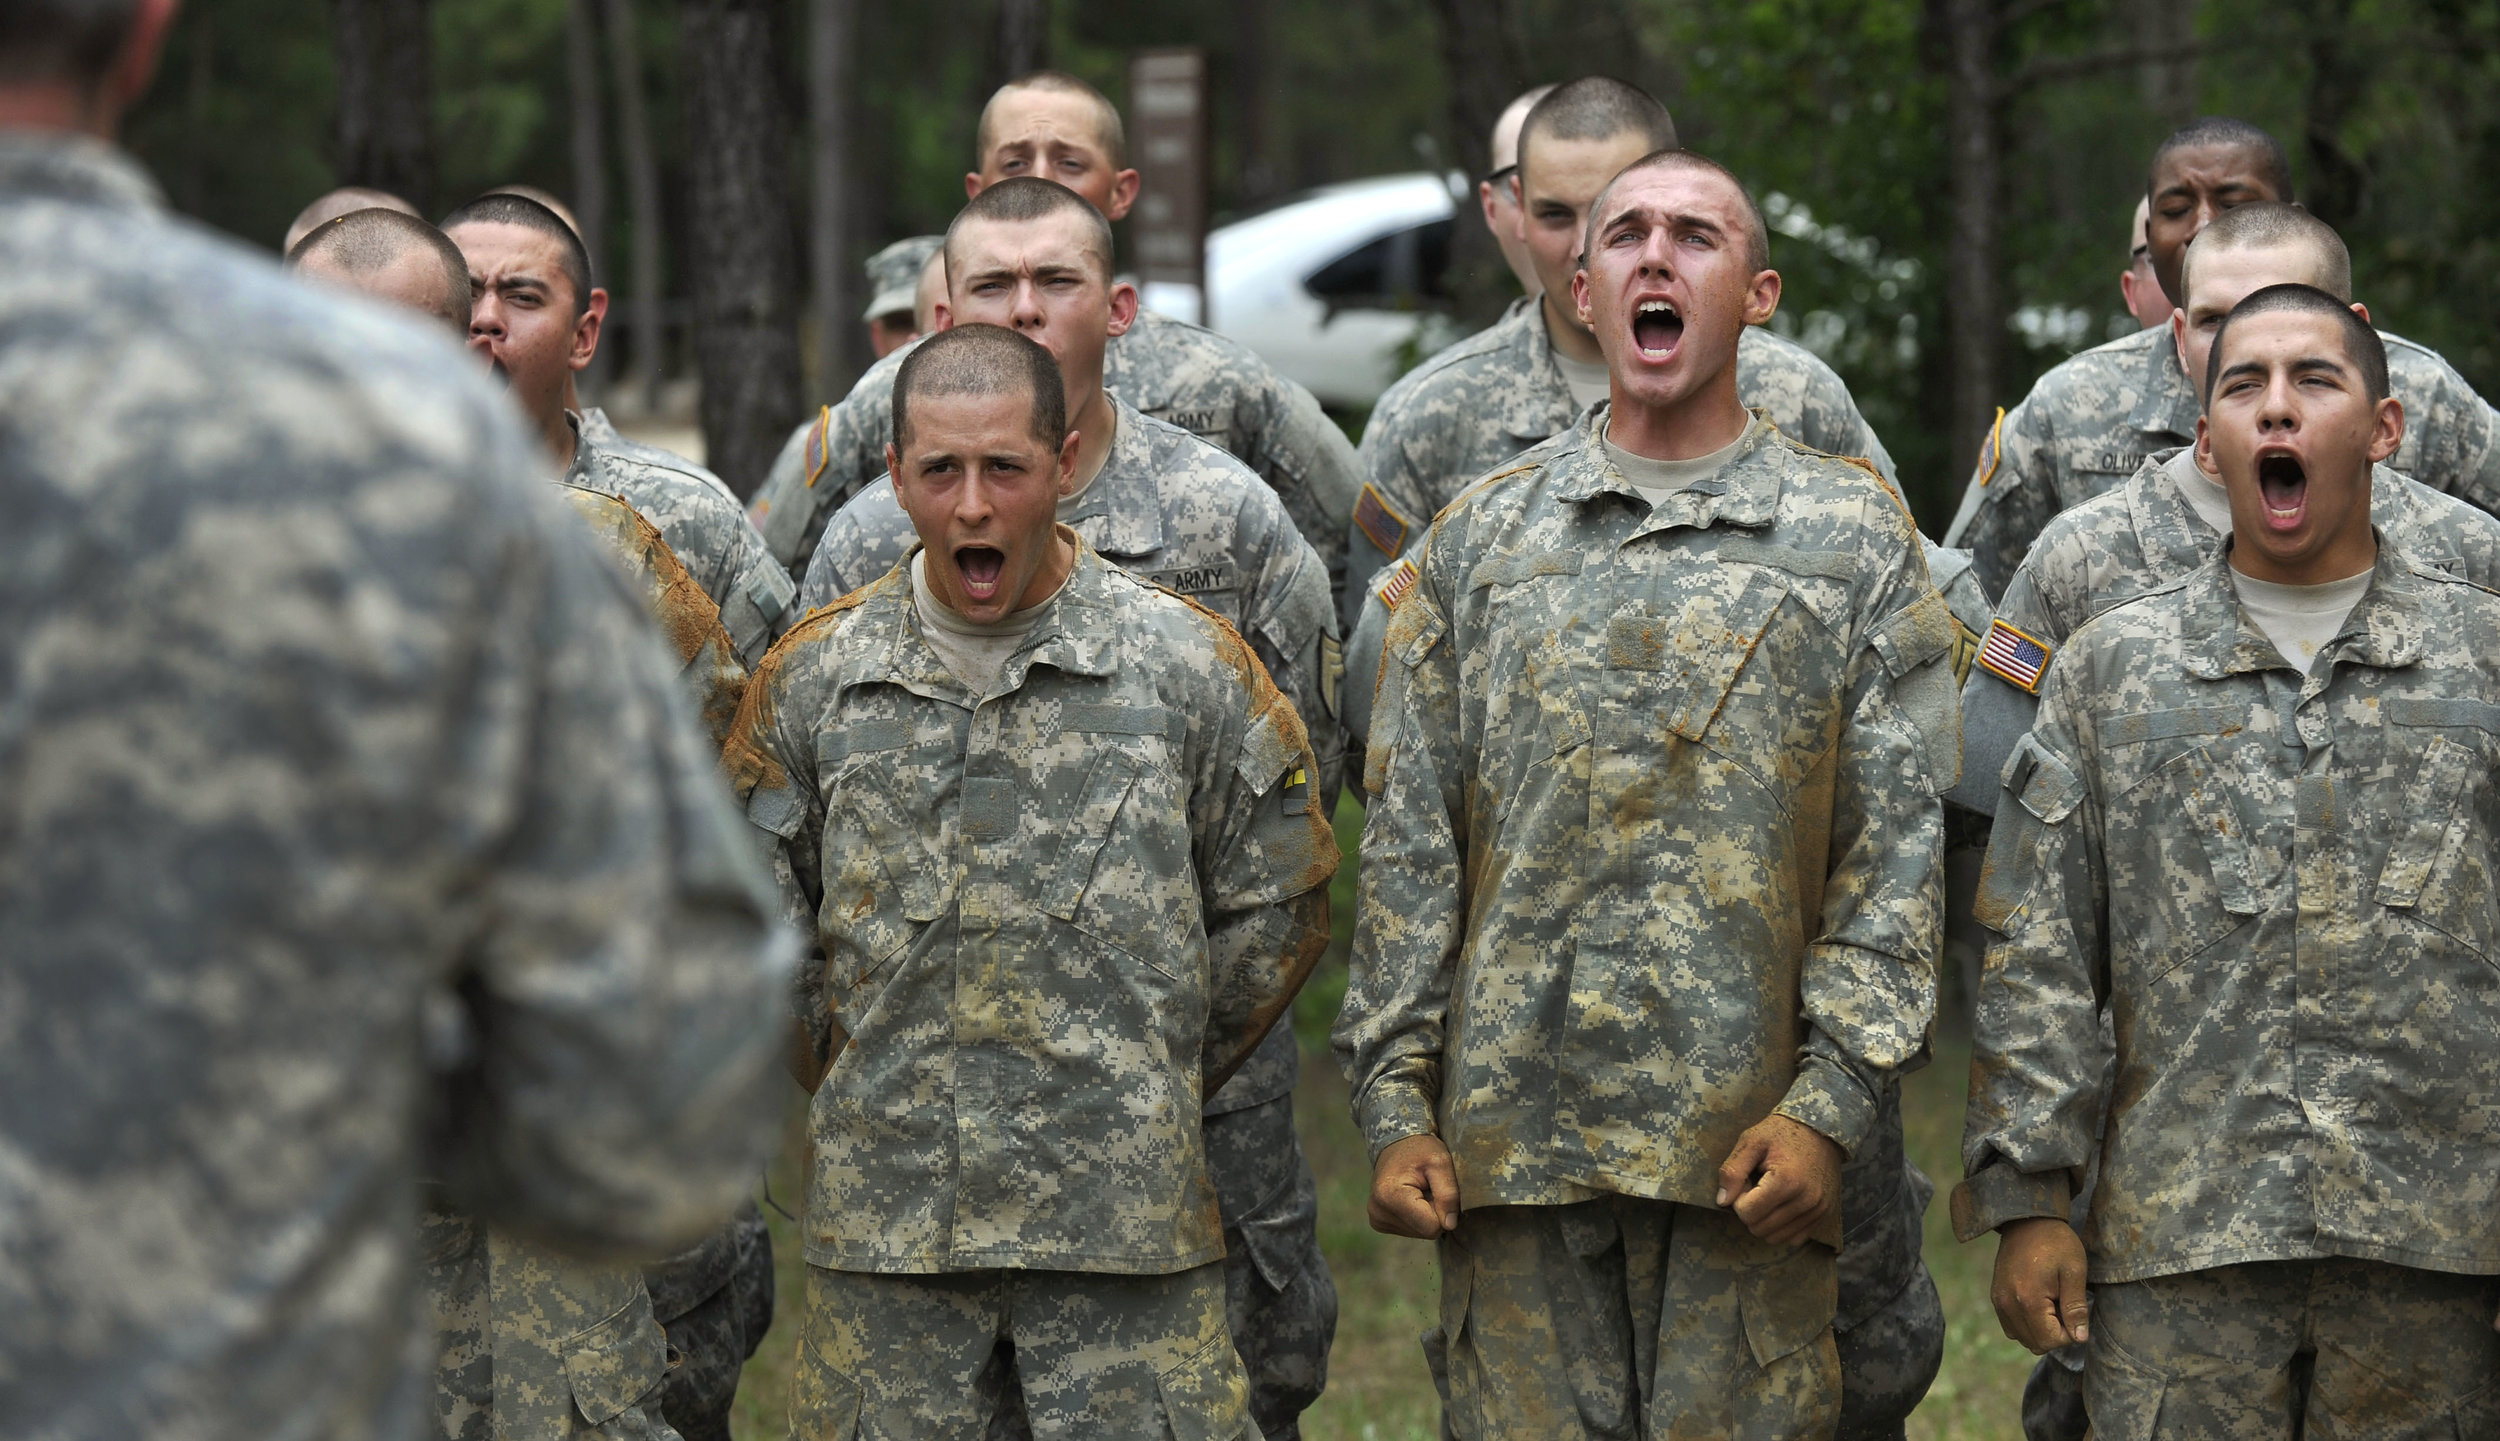 Army recruits in basic training on Fort Benning, Georgia.(Glenn Fawcett/U.S. Army Photo)